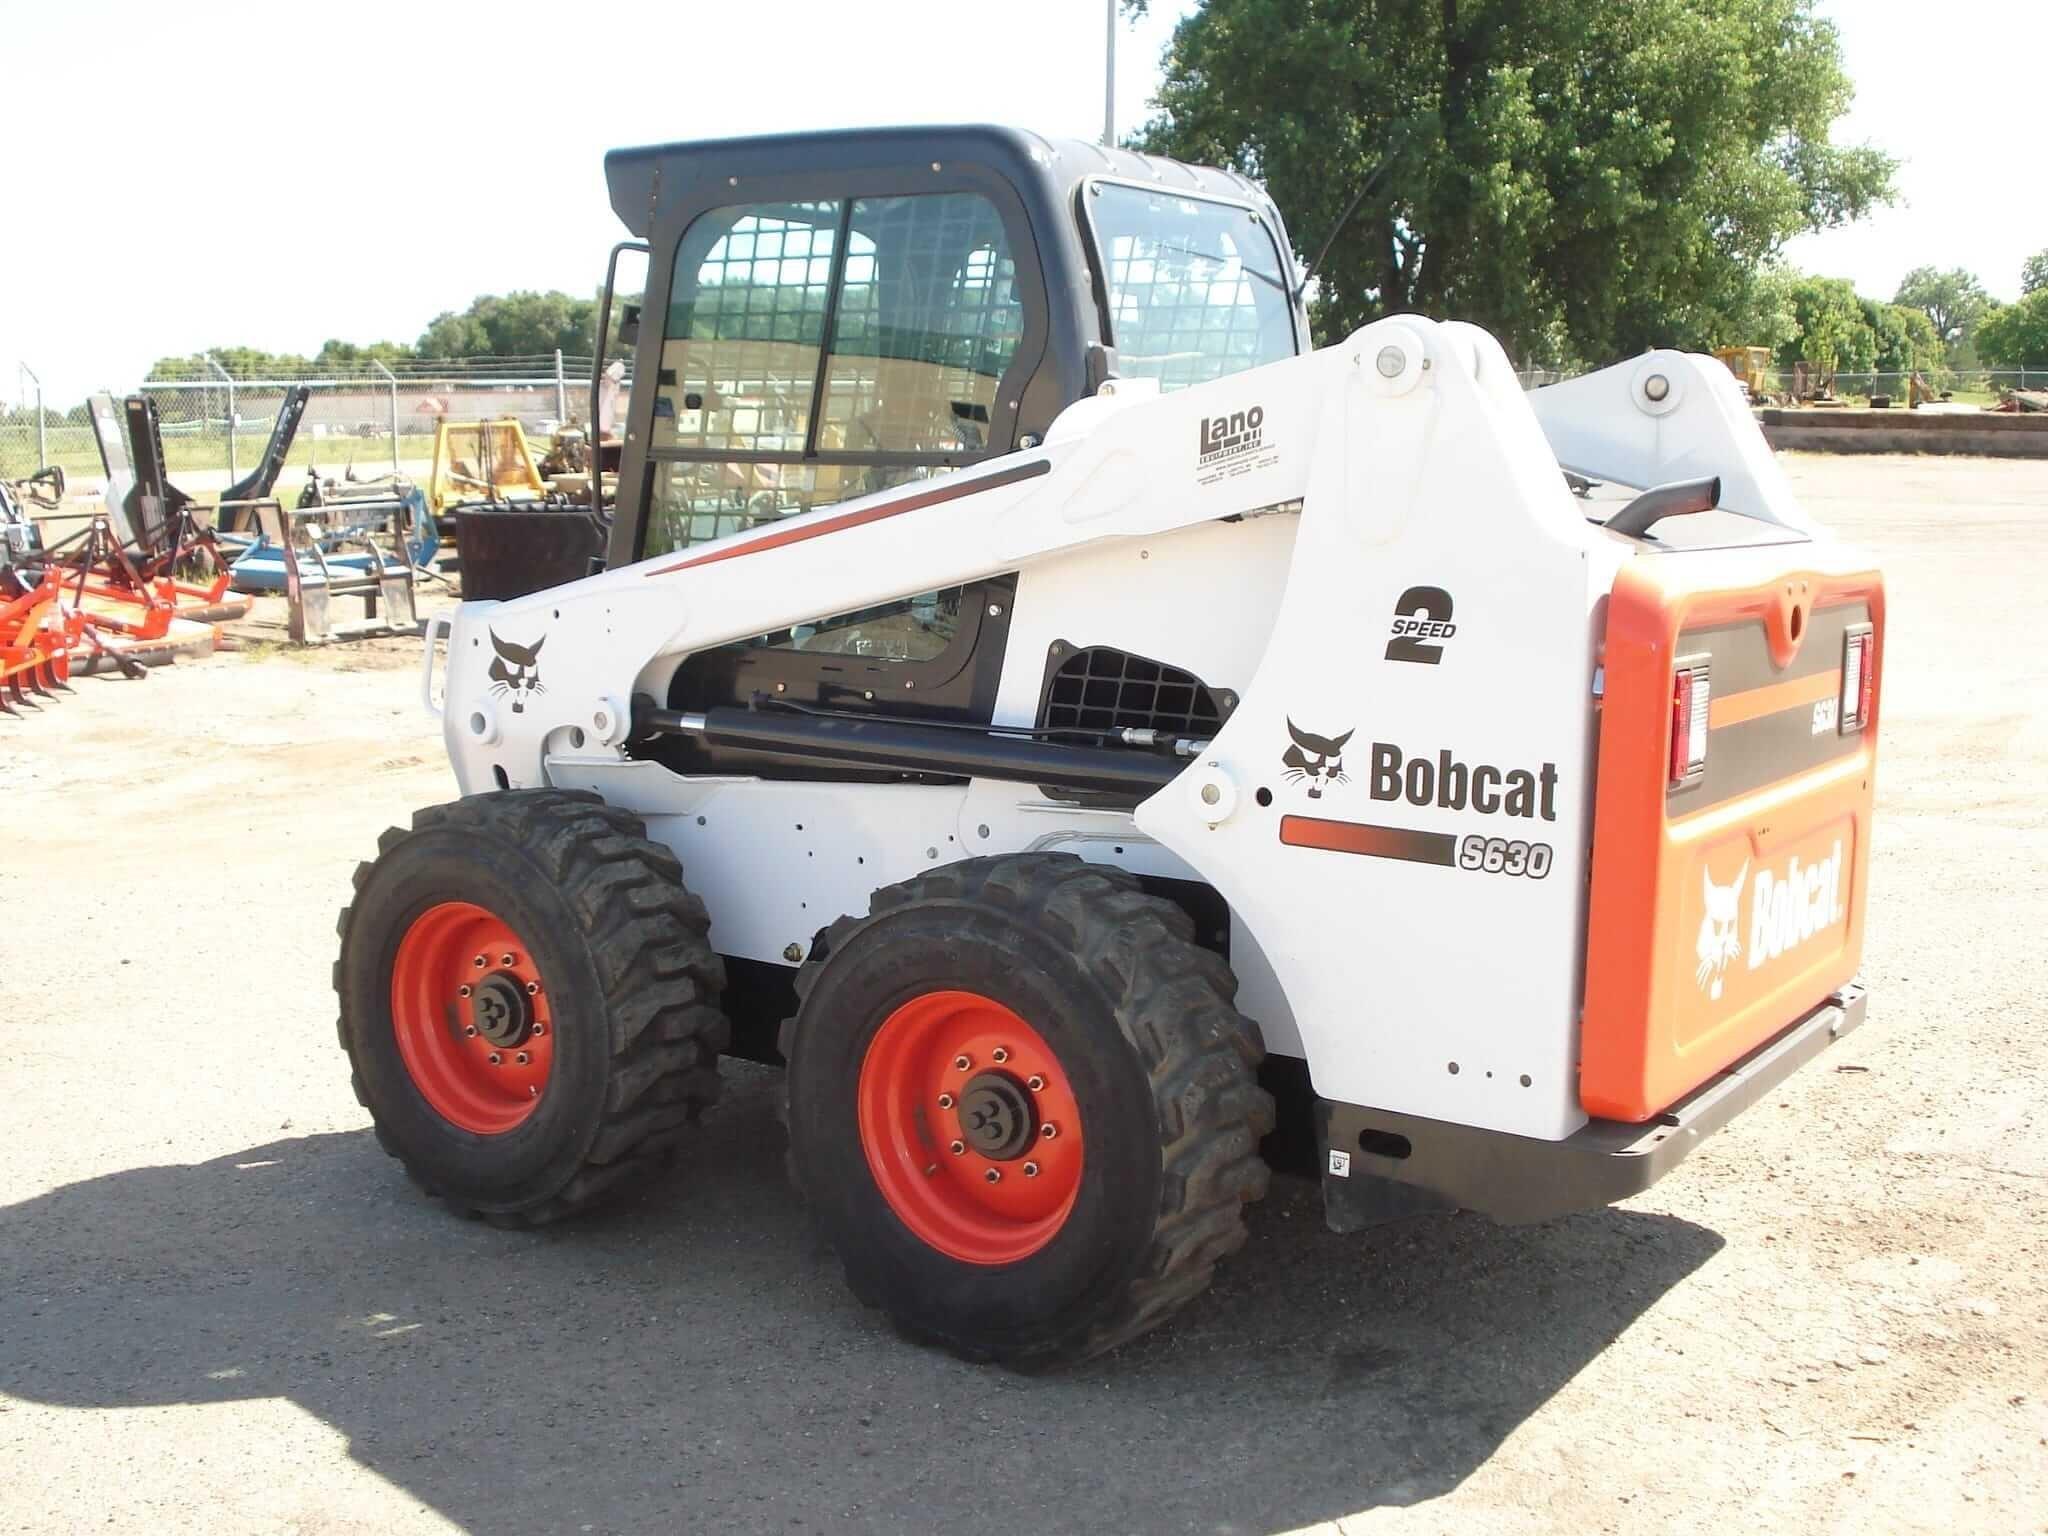 2019 Bobcat S630 Skid Steer